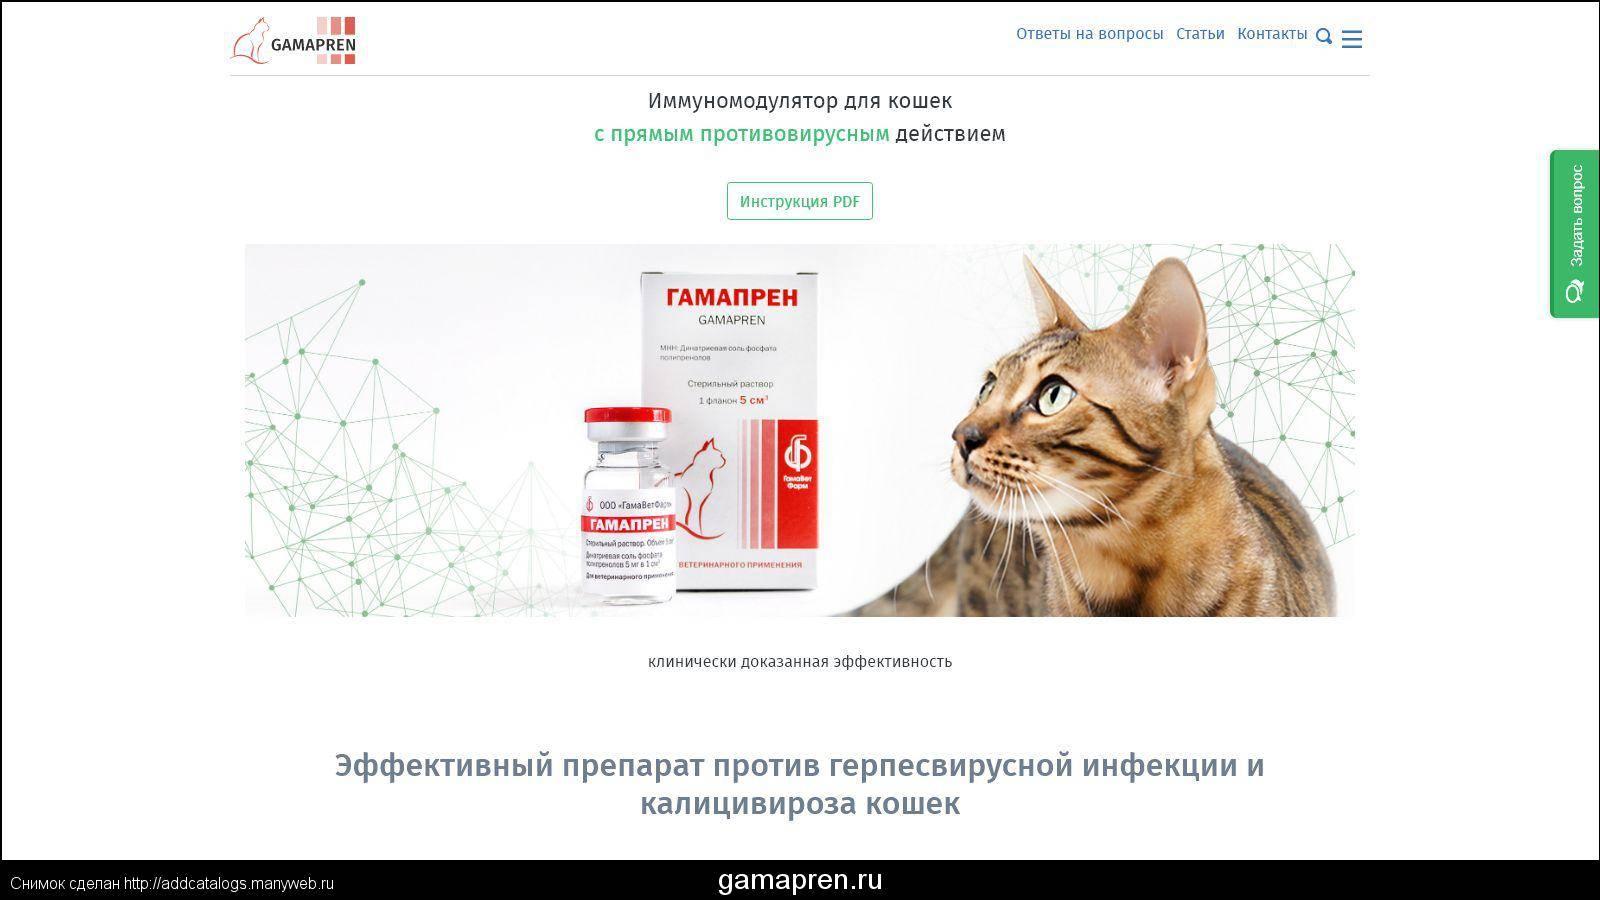 Калицивироз кошек. применение препарата гамапрен